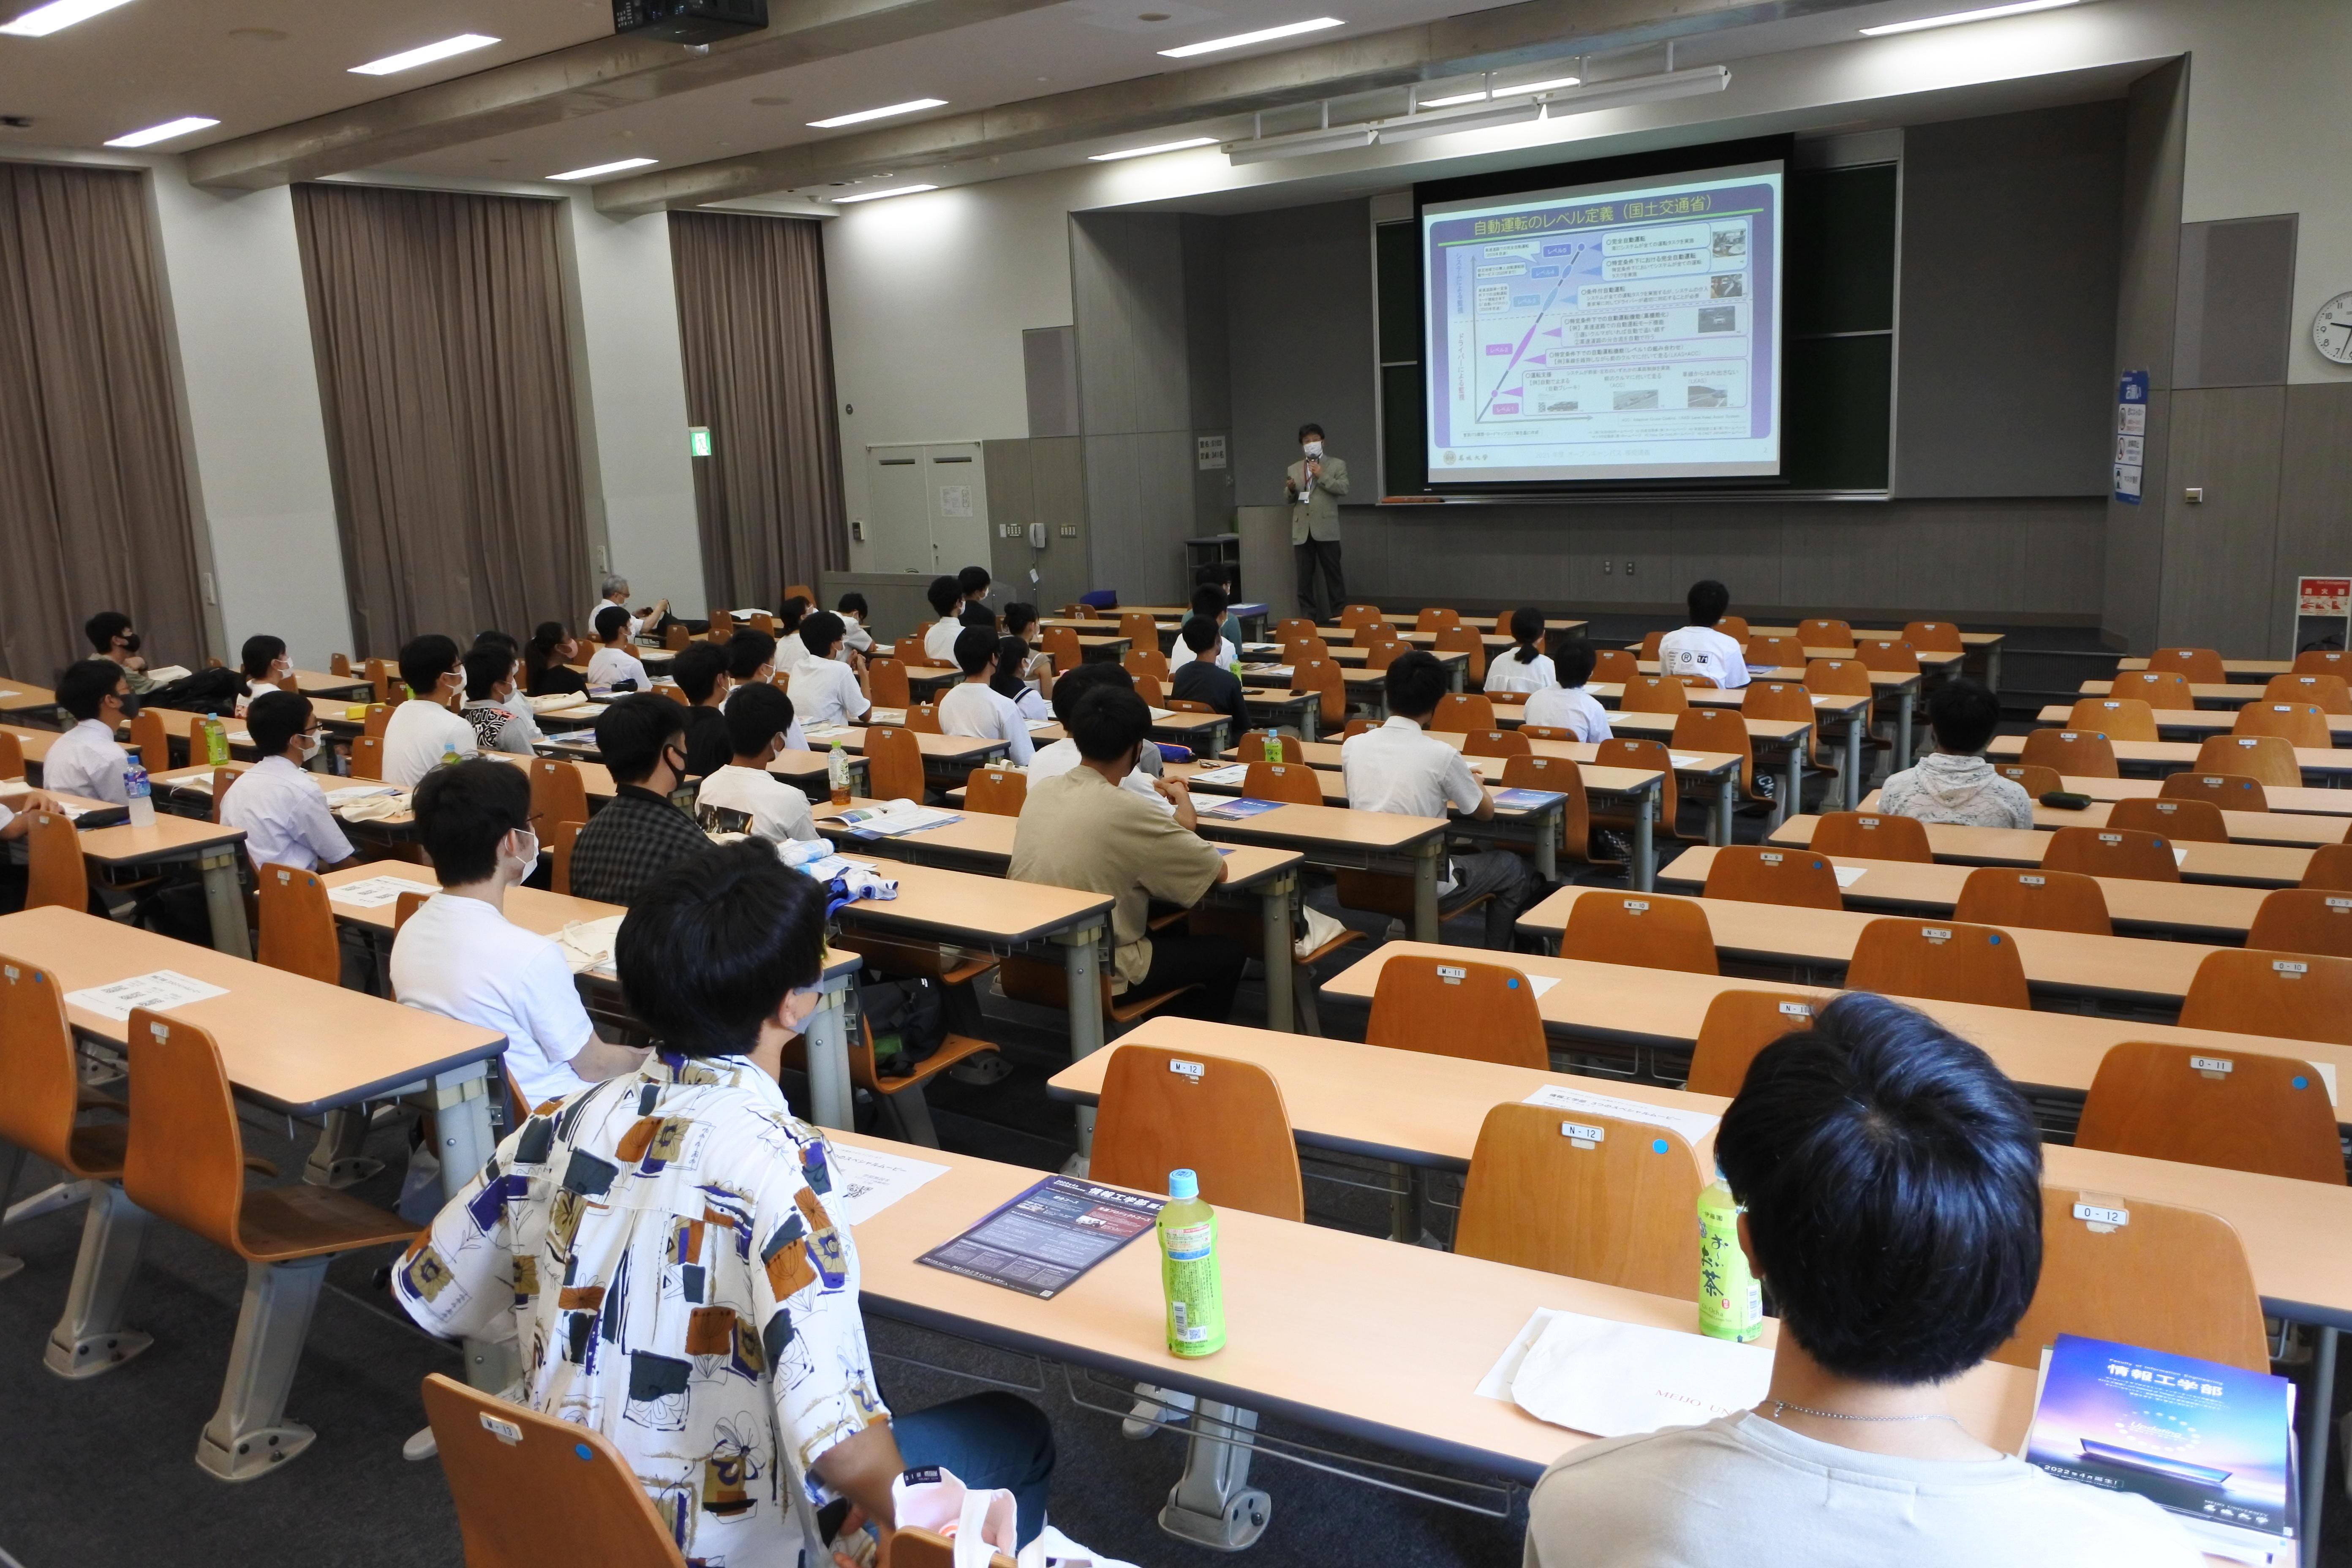 理工学部情報工学科の山田宗男教授(副学長)による情報工学部の模擬講義